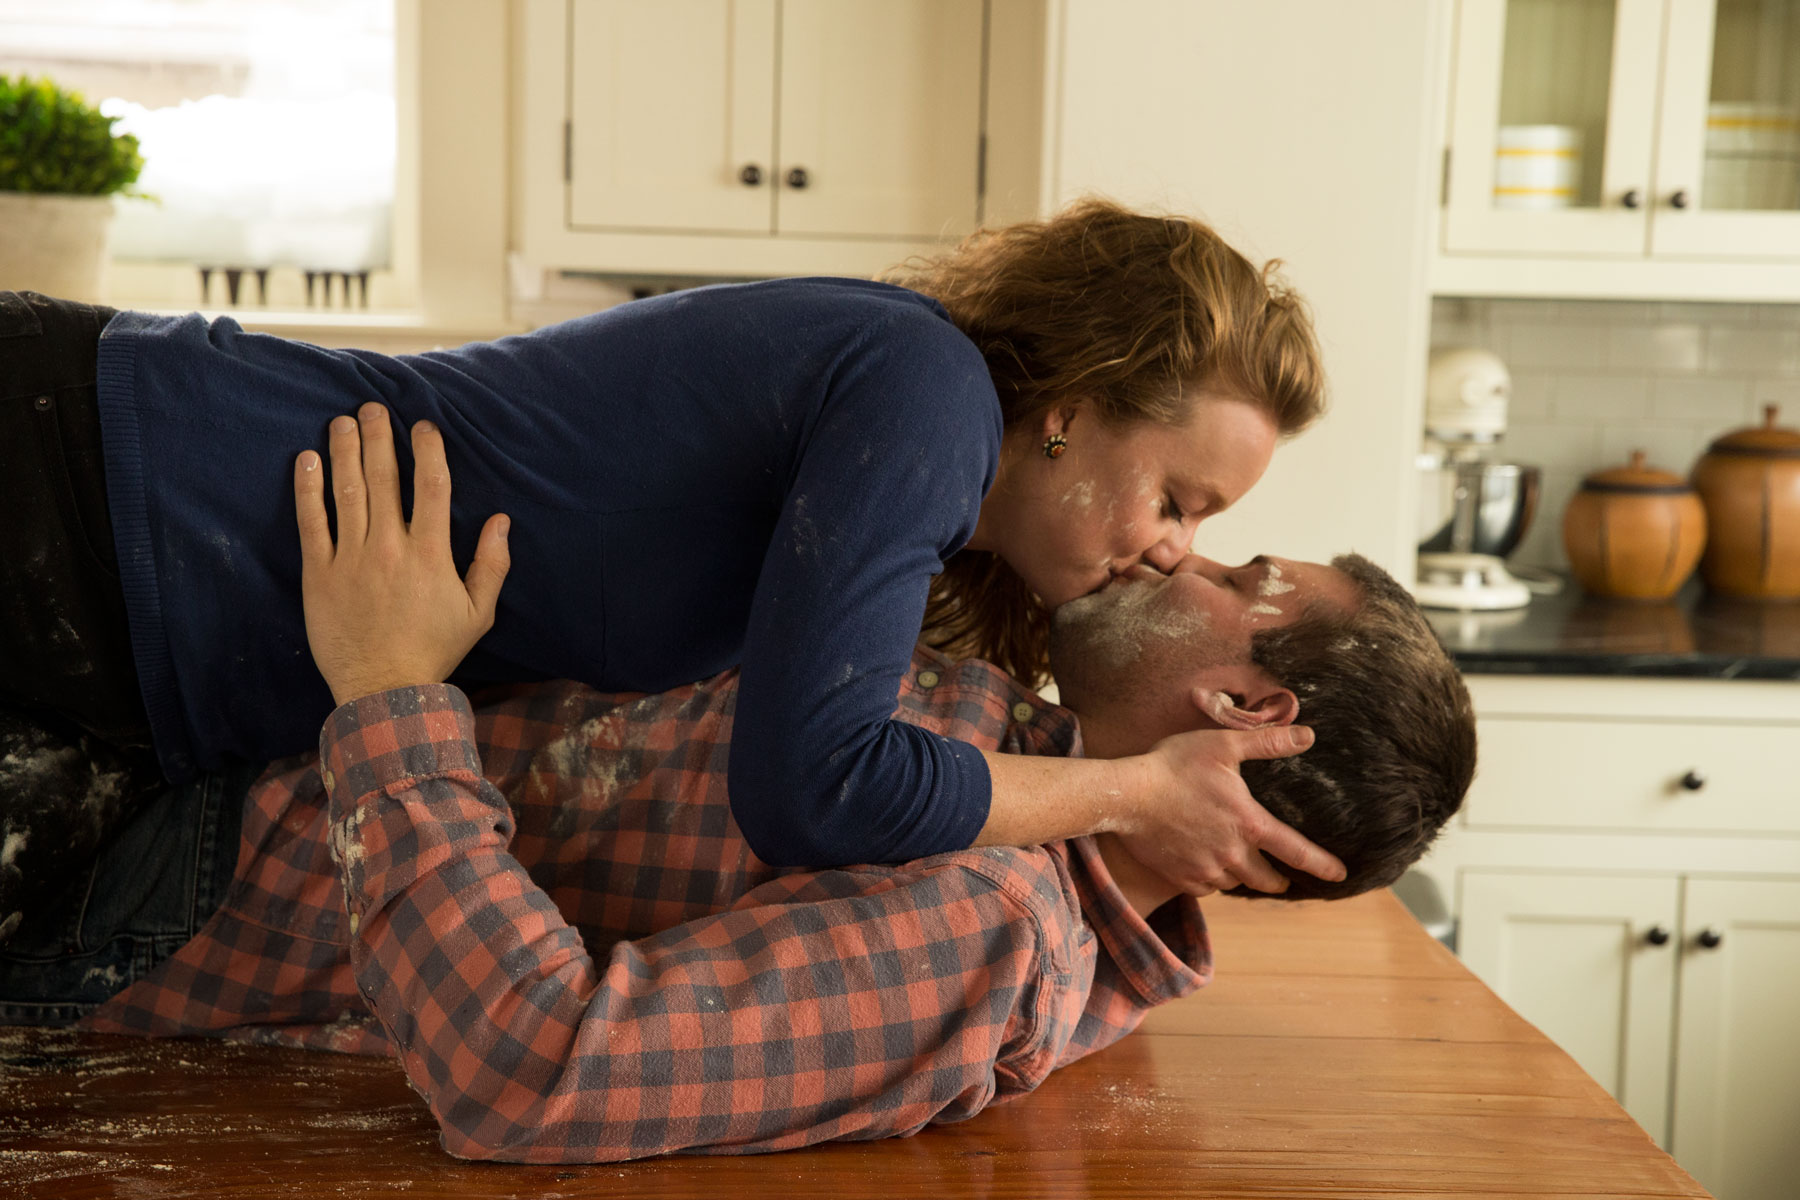 Couple_Kissing_Kitchen_George_Lange_Lifestyle.jpg